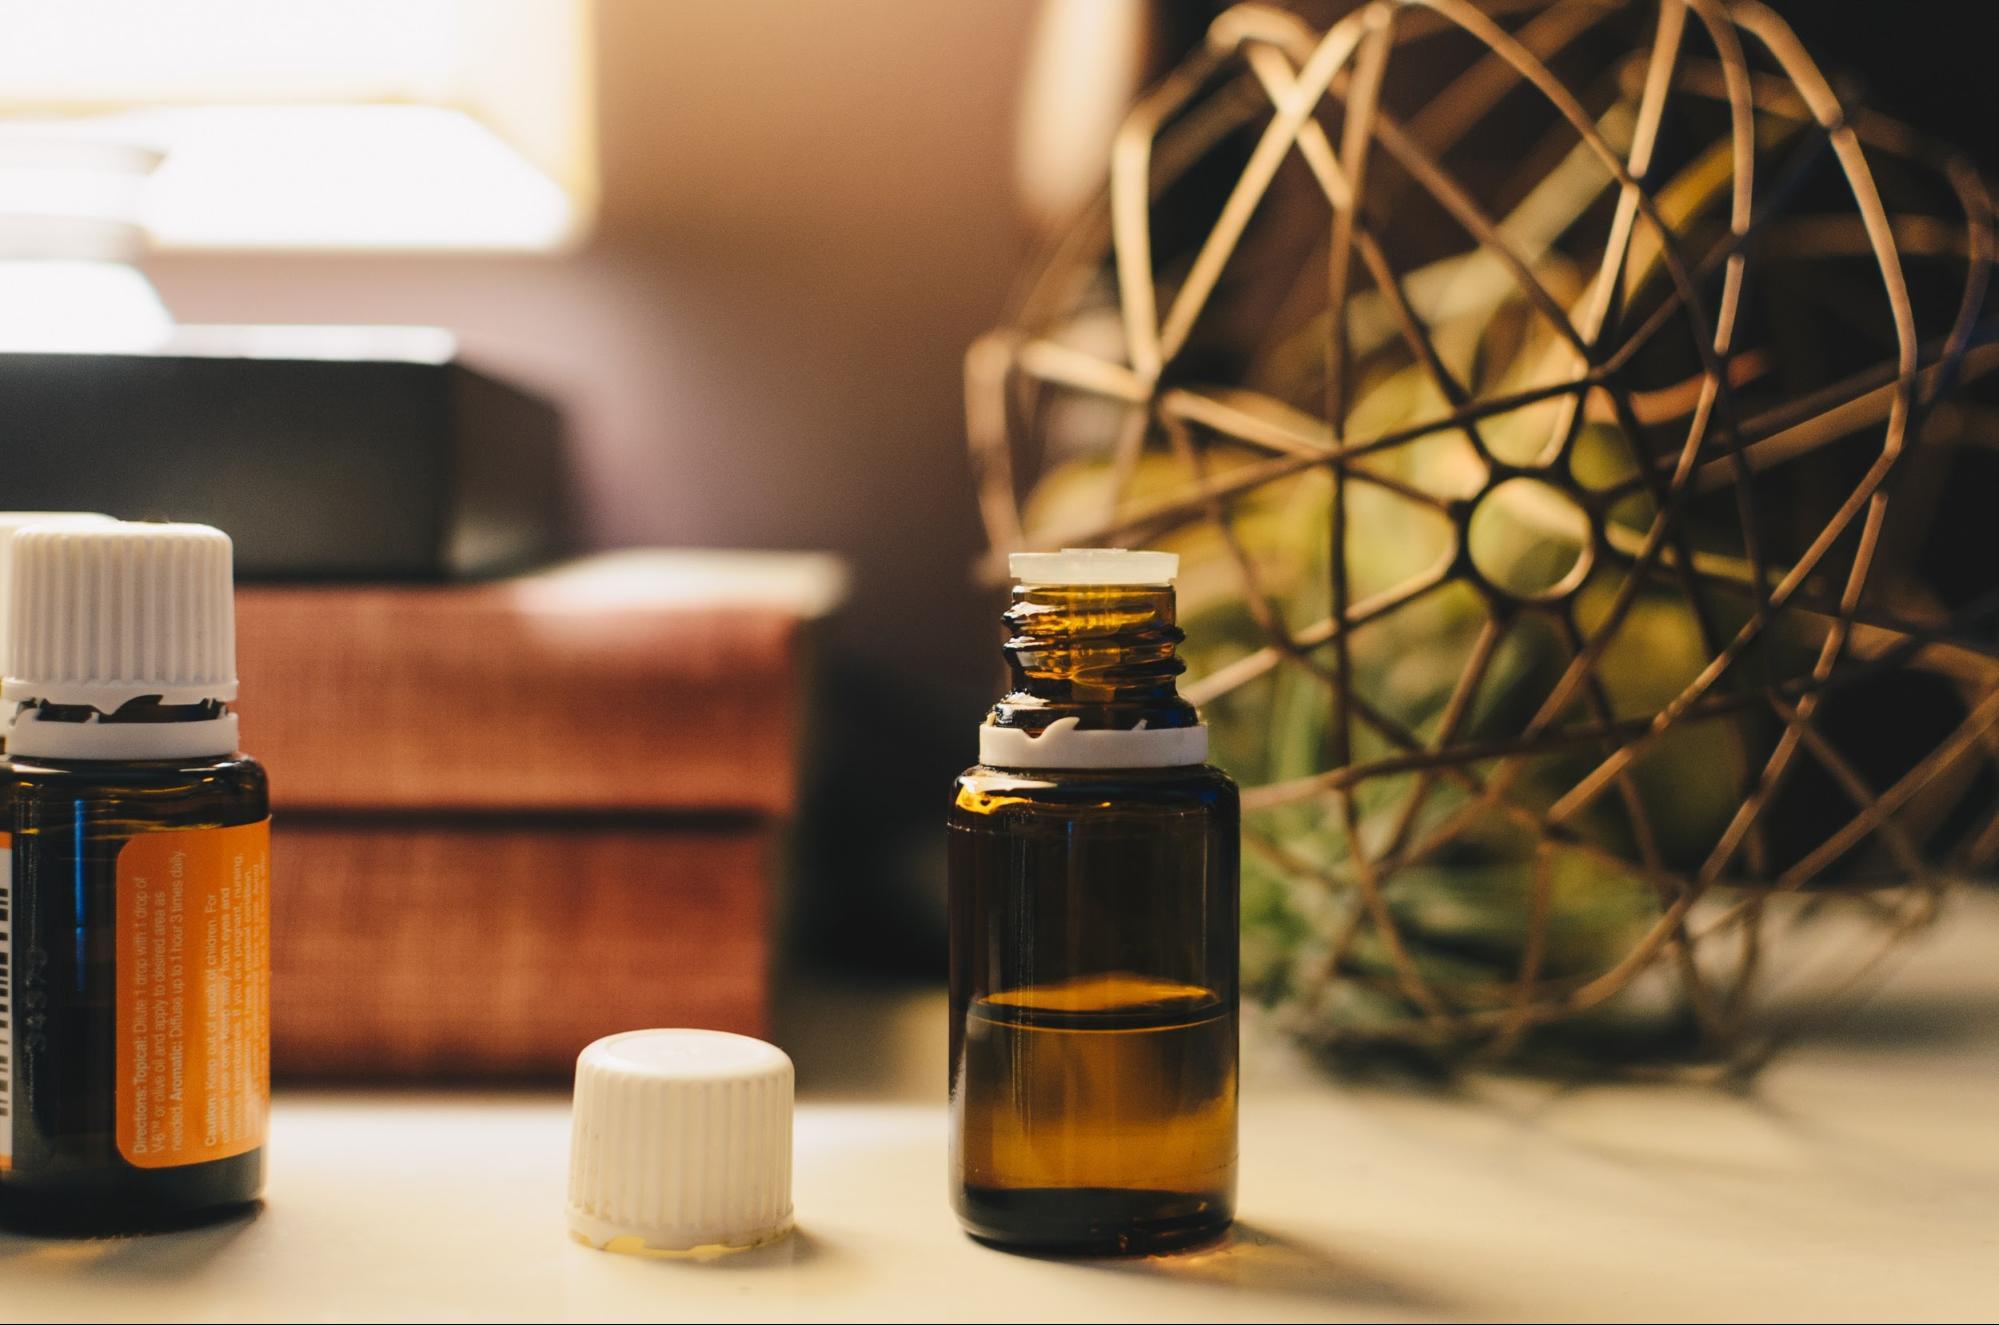 aromatherapy-shower-remodel-ideas-beverly-godfrey-design-build.jpg